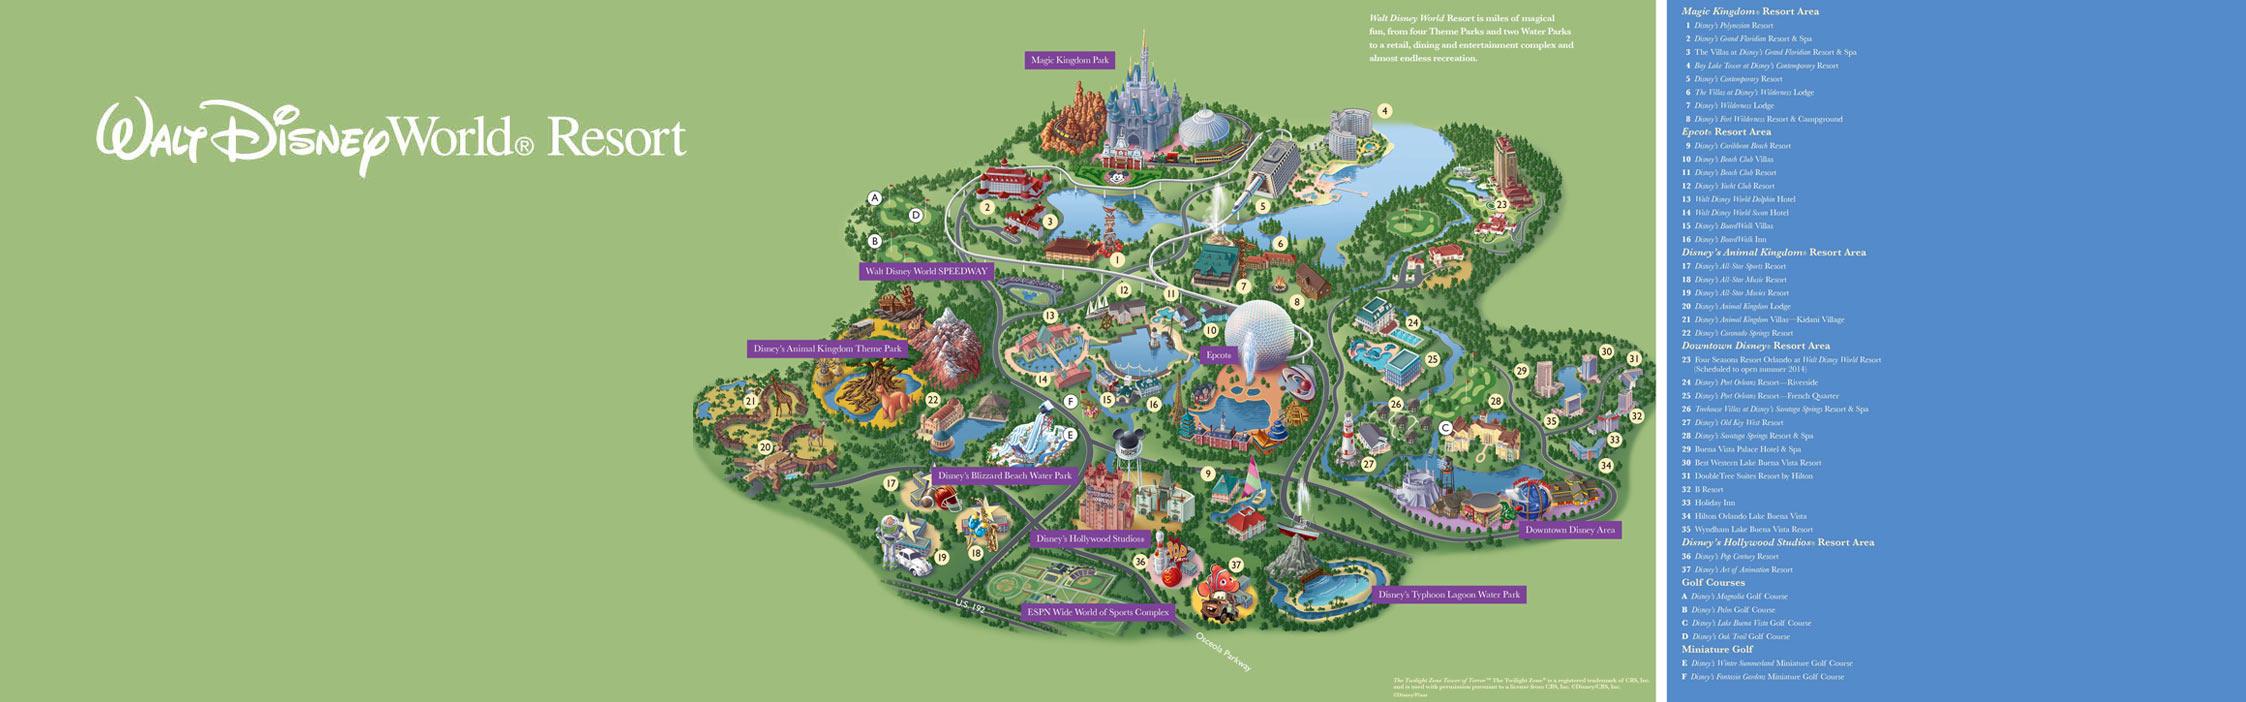 Walt Disney World® Resort Map- Wyndham Lake Buena Vista - Hotel Near - Disney World Florida Hotel Map